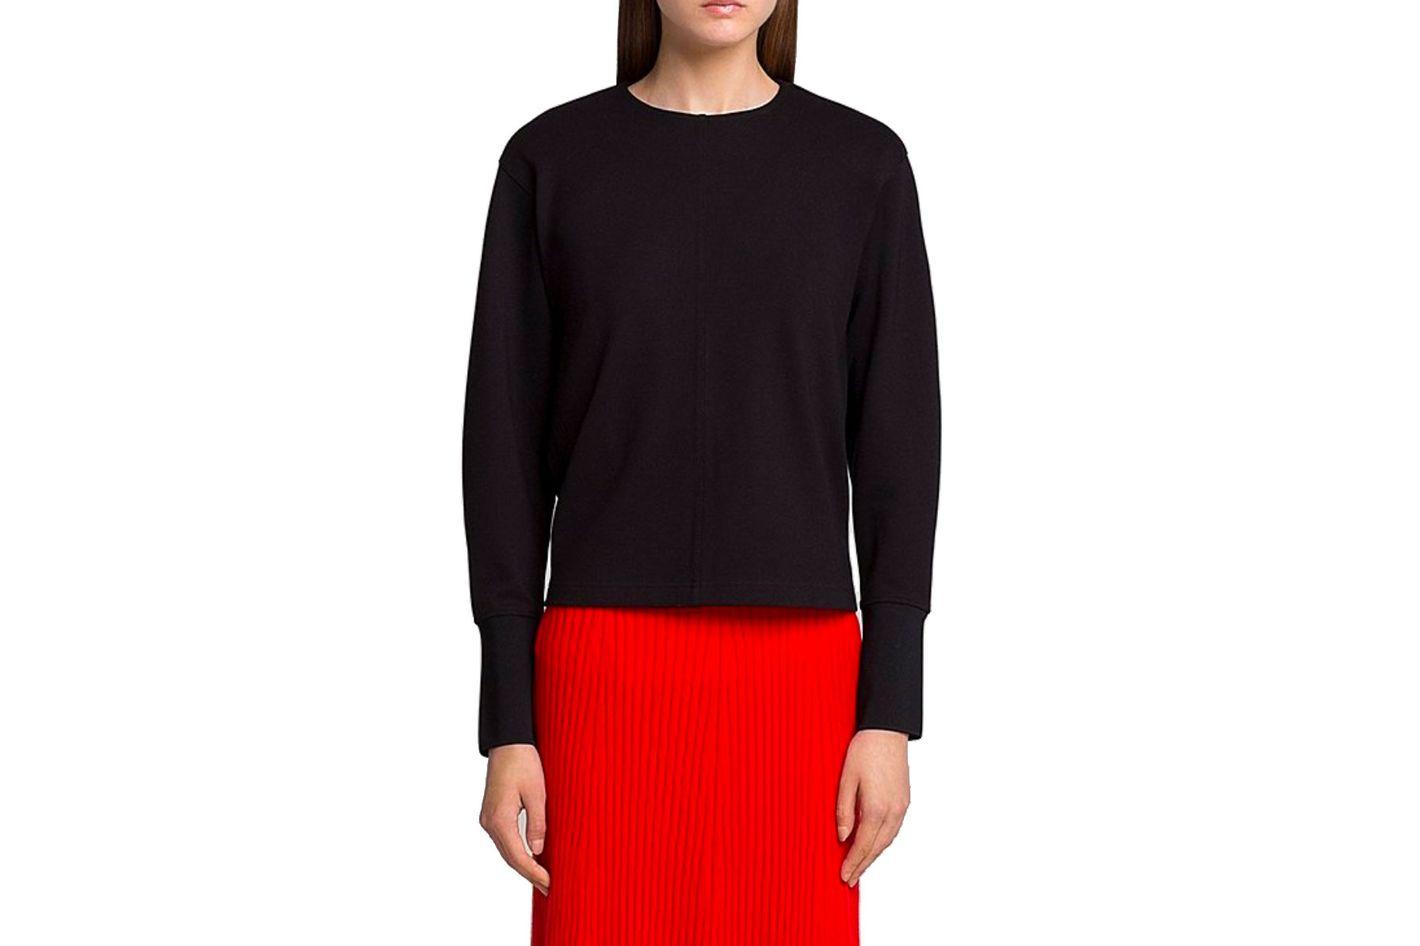 Uniqlo U Crewneck Long Sleeve T-shirt